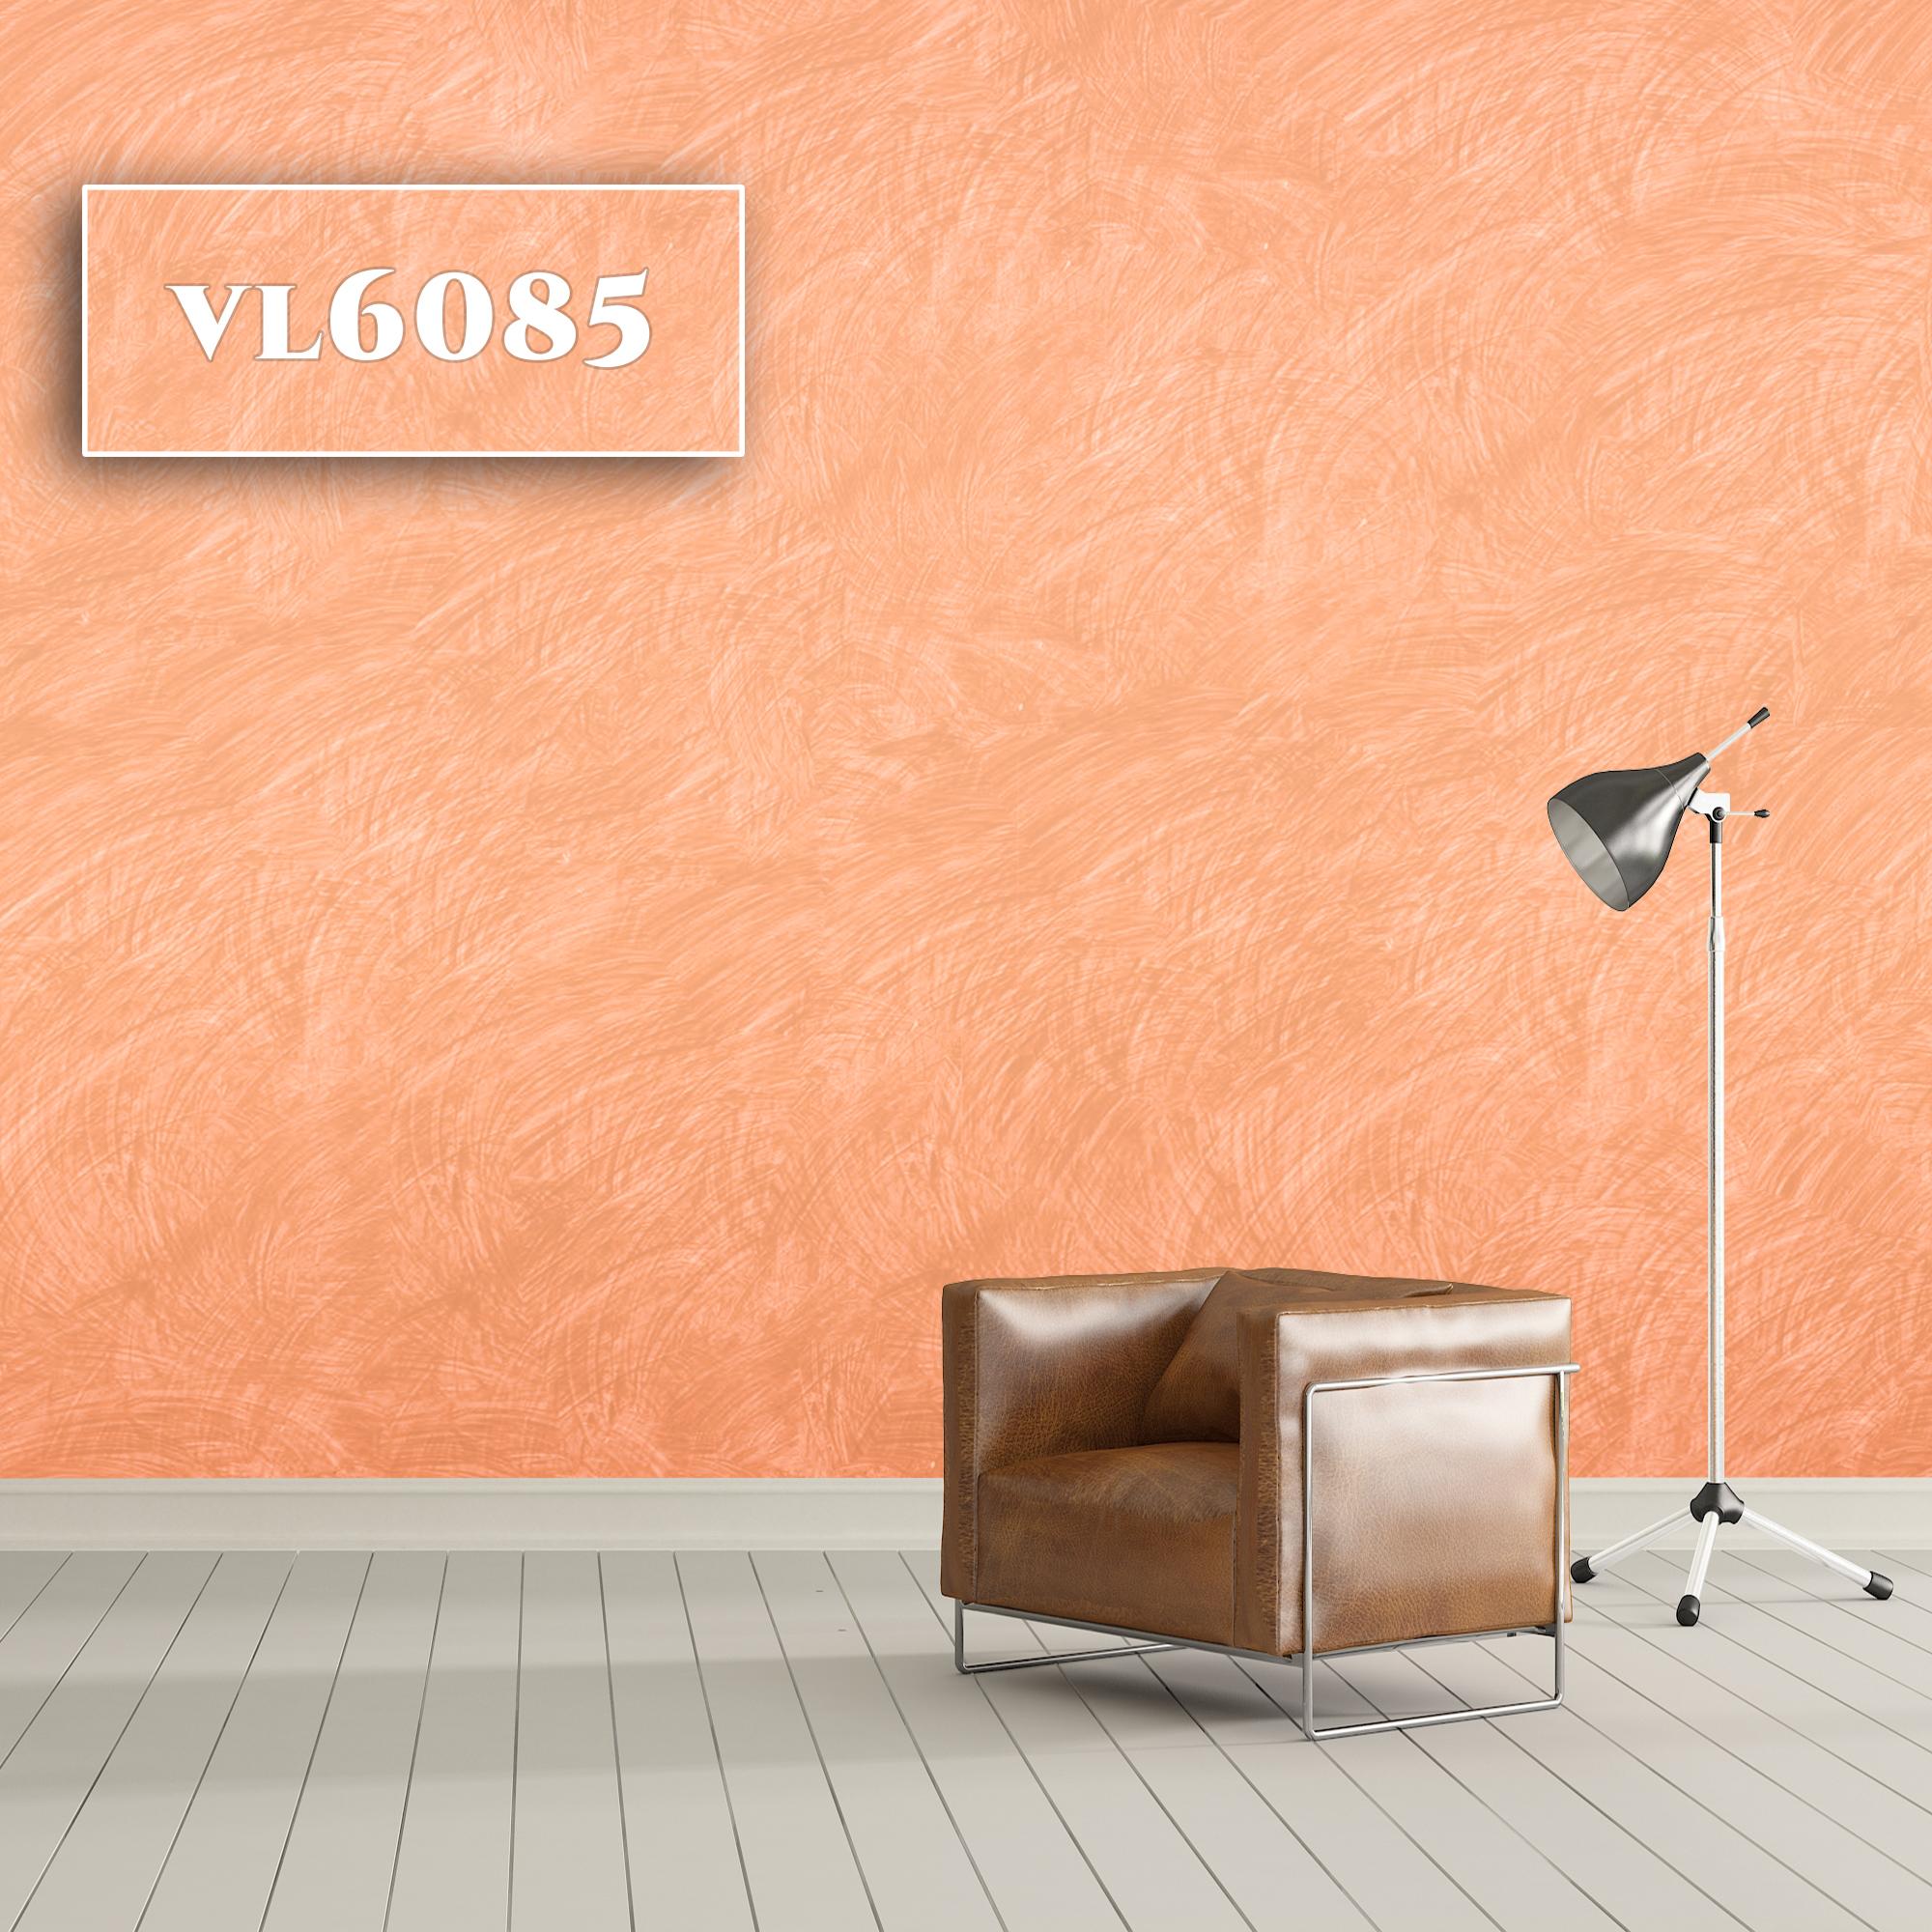 VL6085